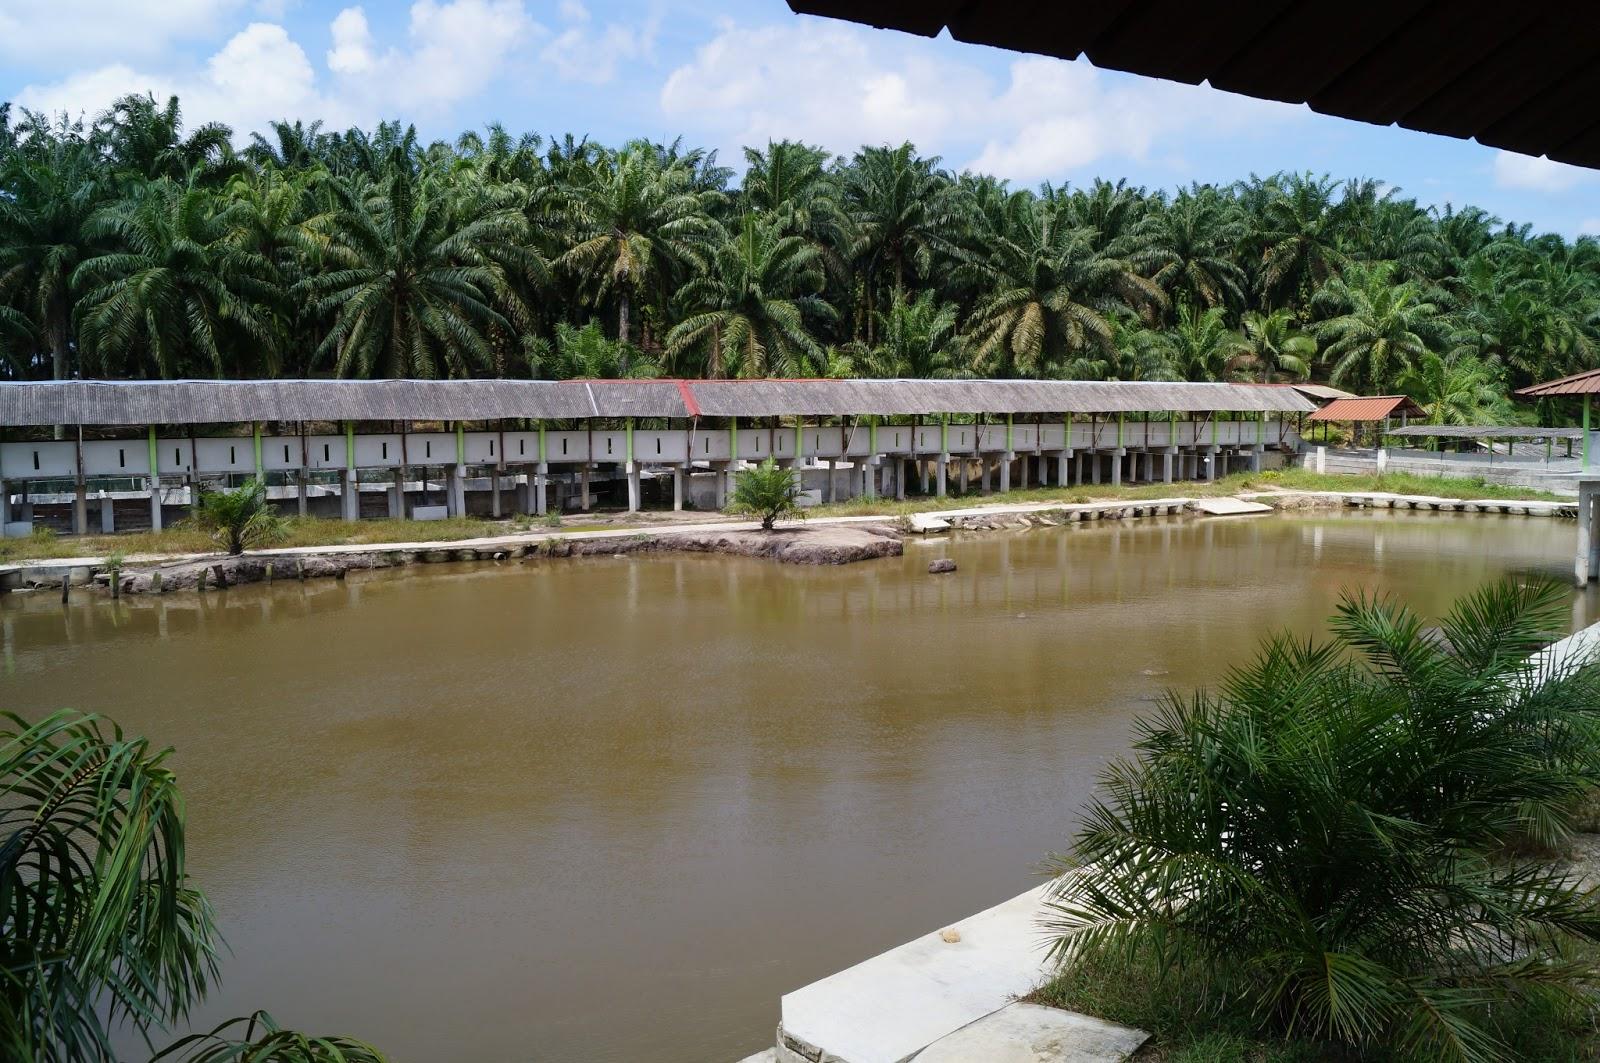 Sasi Our Malaysia Trip 2